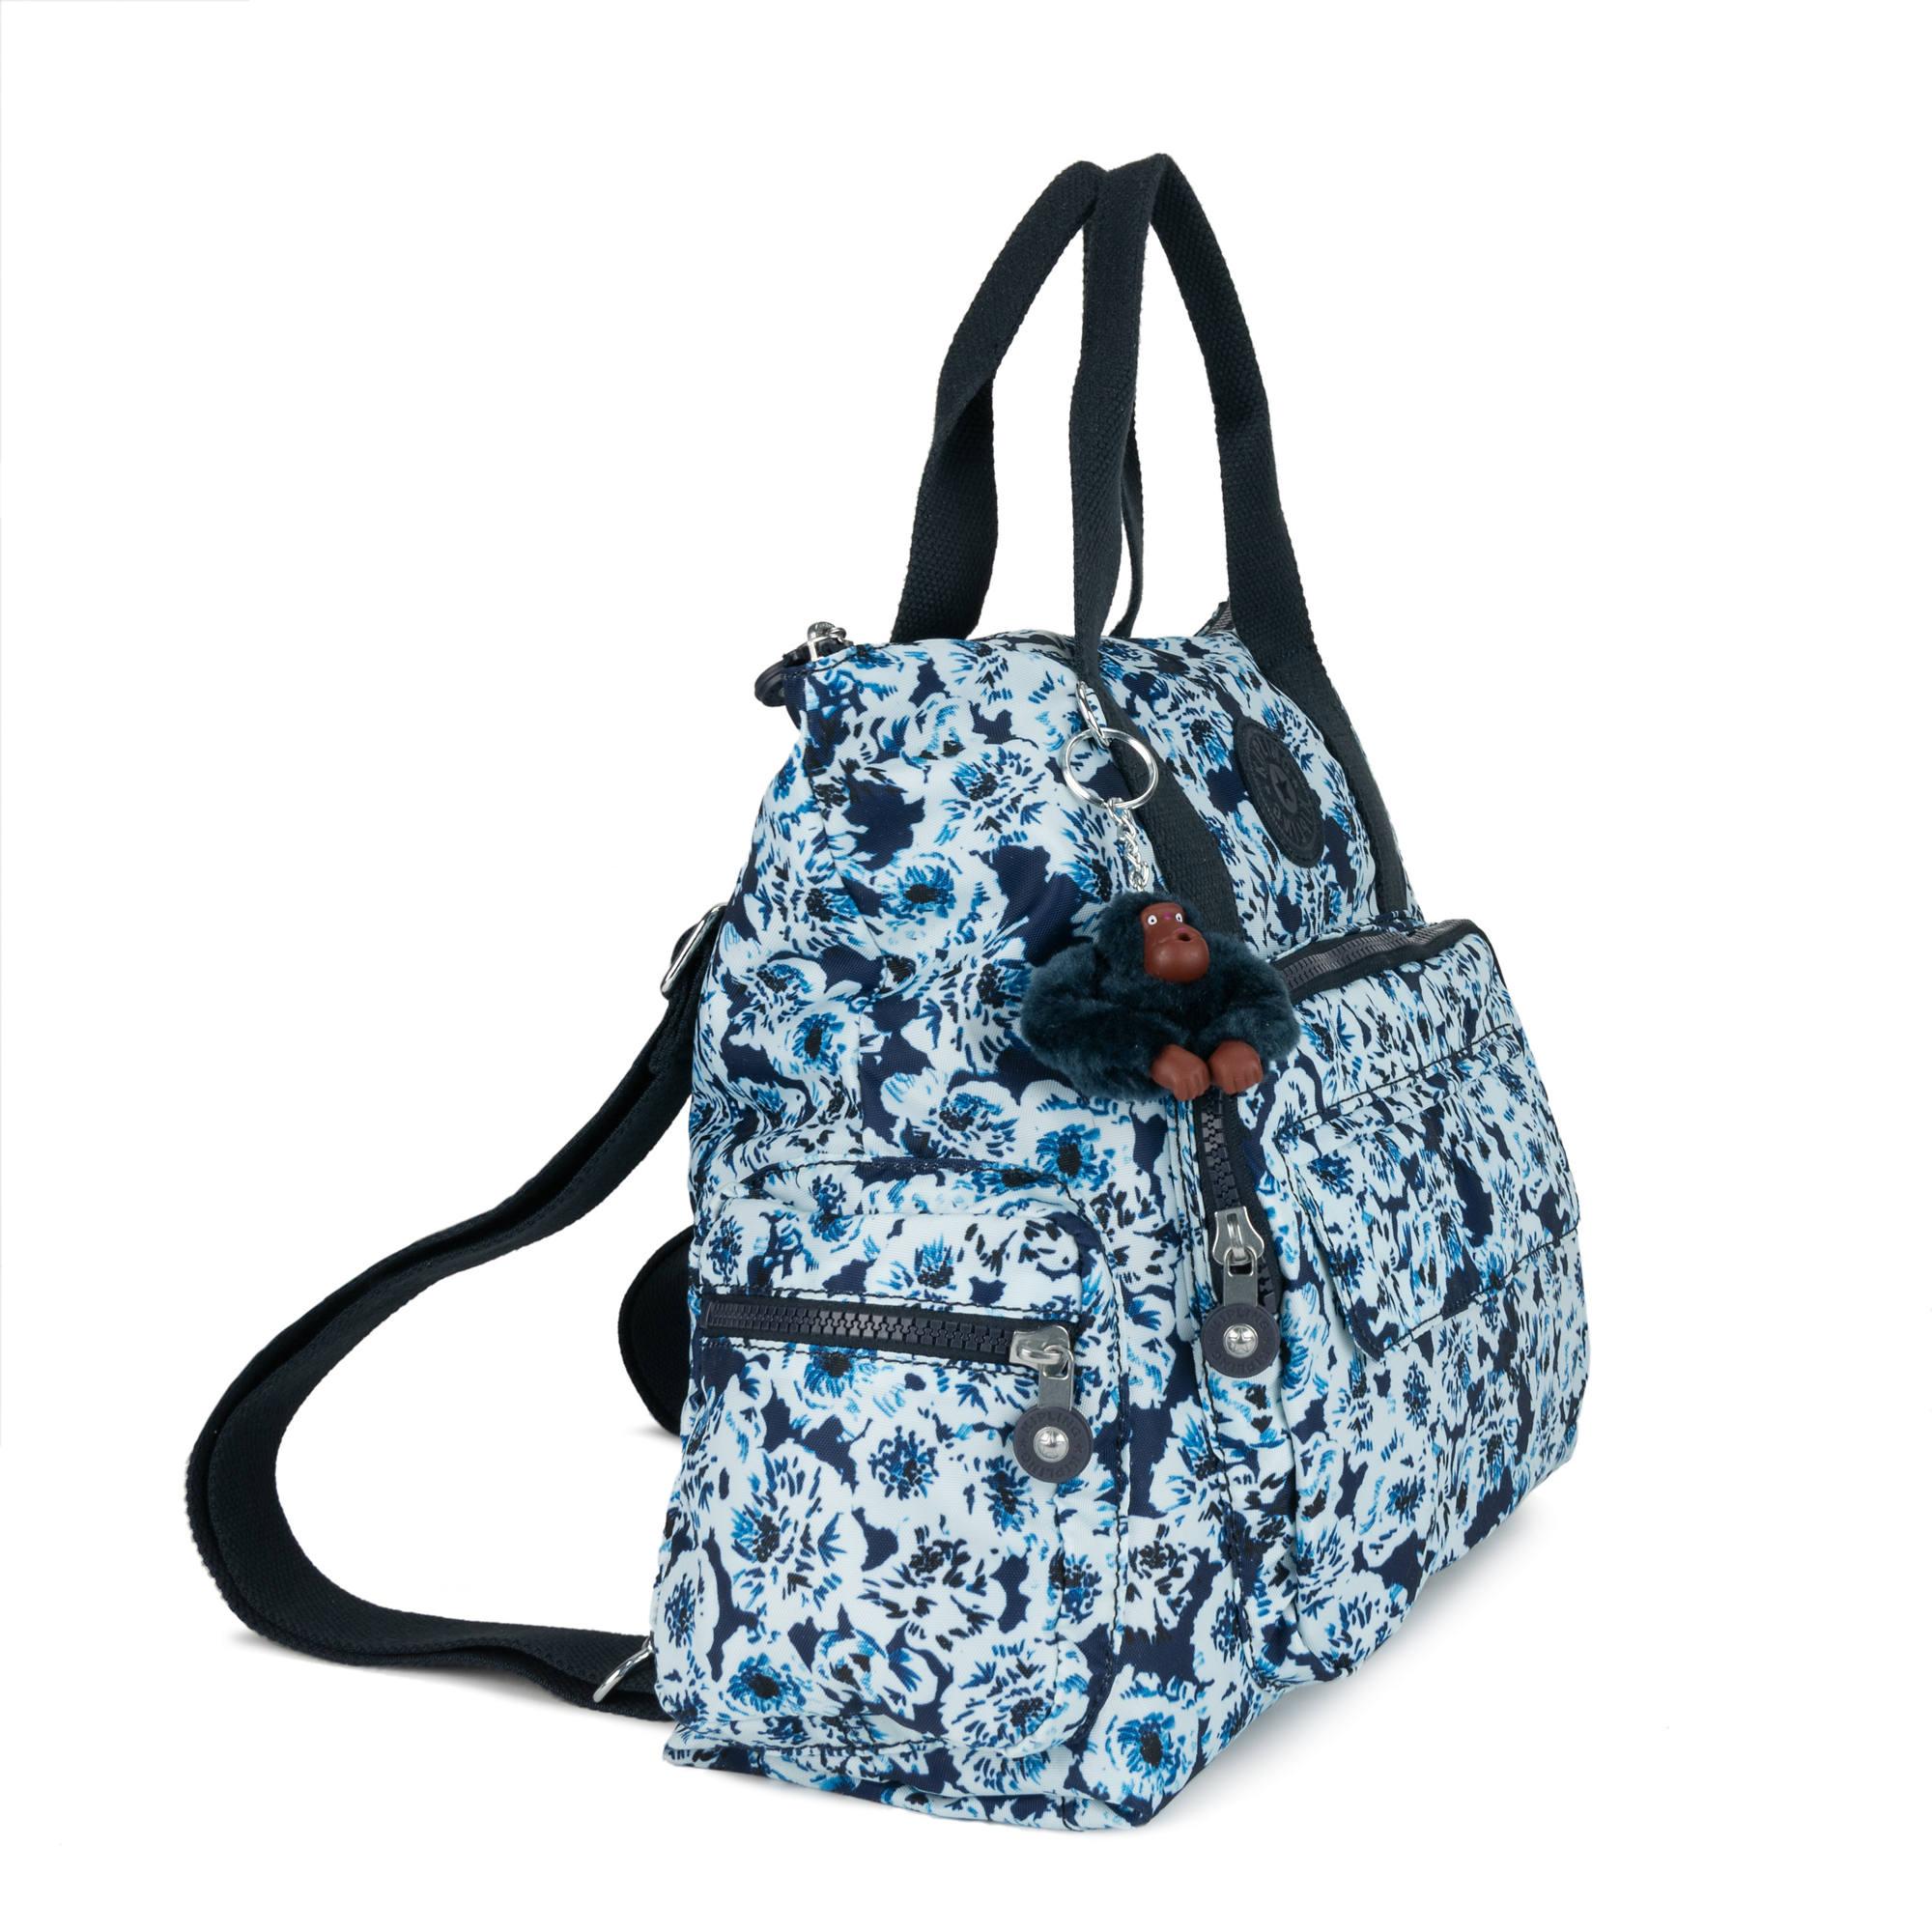 Kipling-Alvy-2-In-1-Convertible-Tote-Bag-Backpack miniatura 32